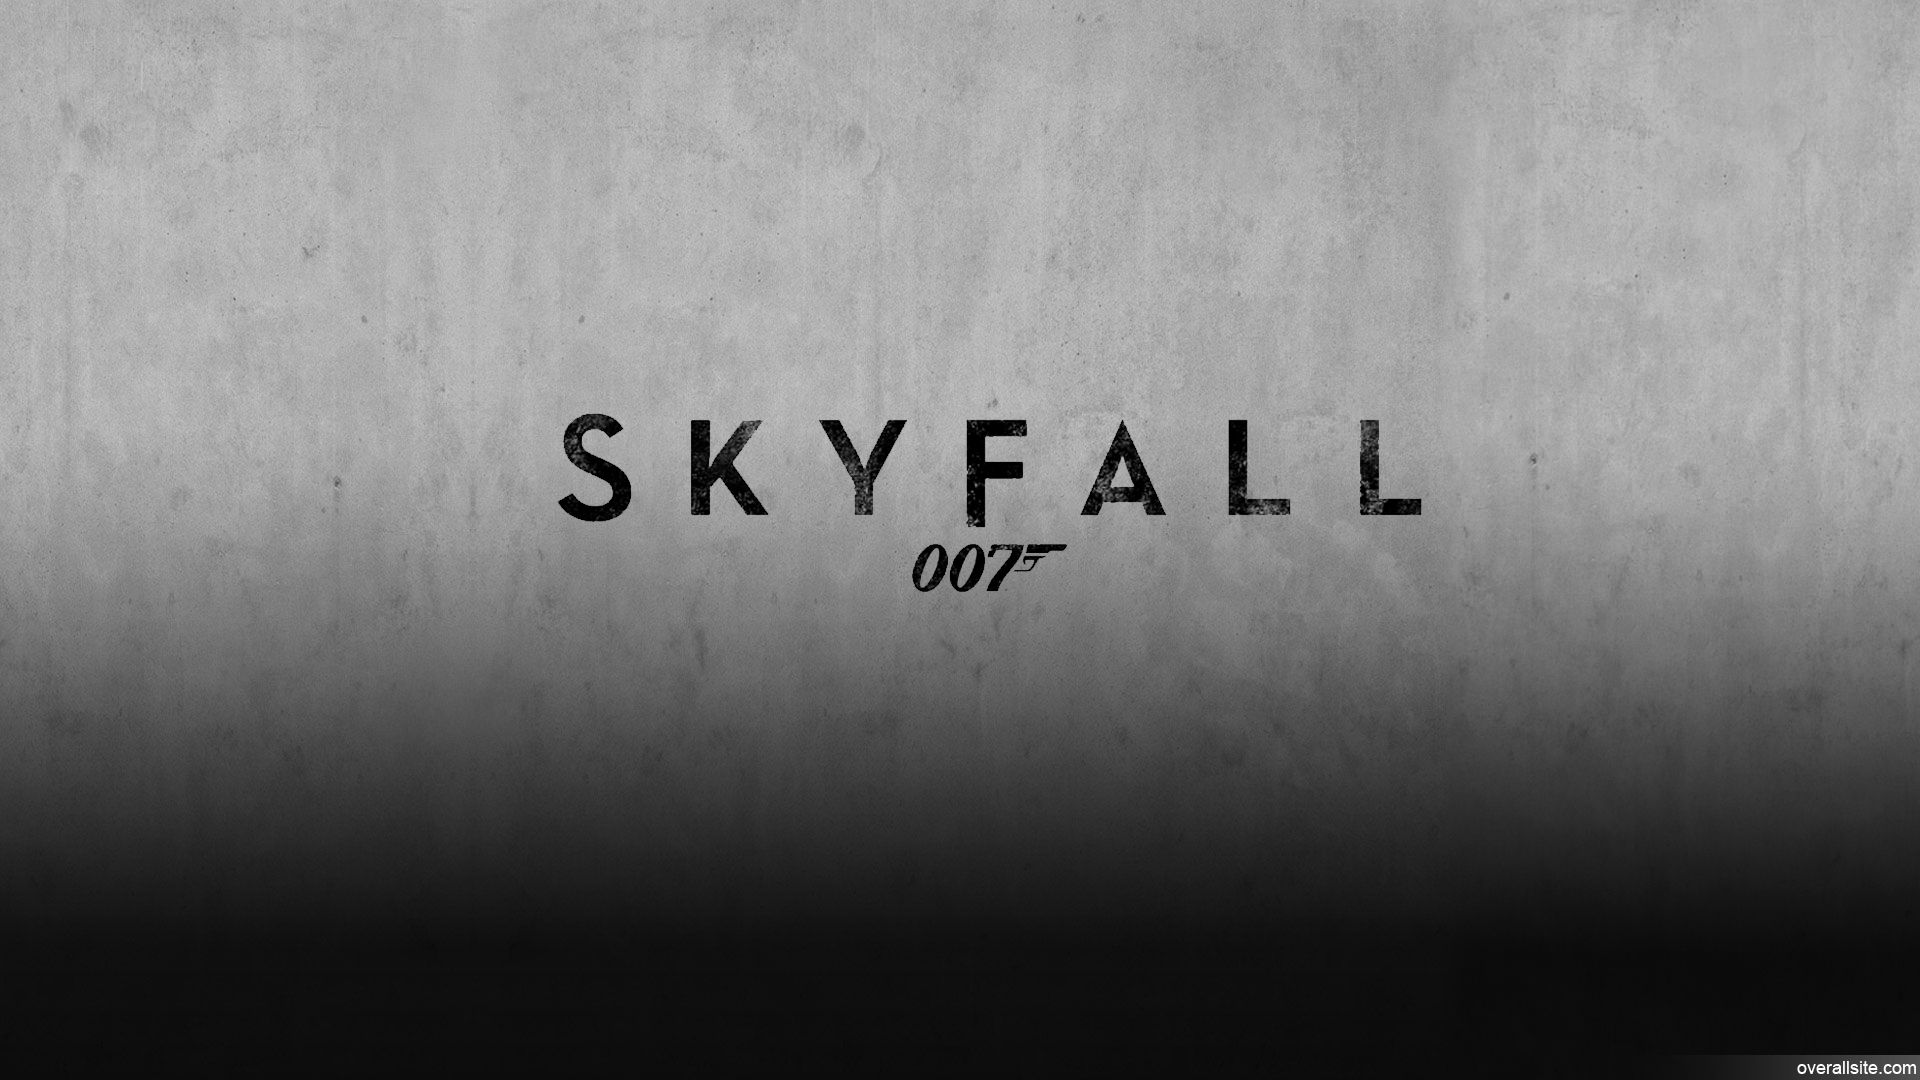 Skyfall Wallpaper Skyfall Best James Bond Movies Bond